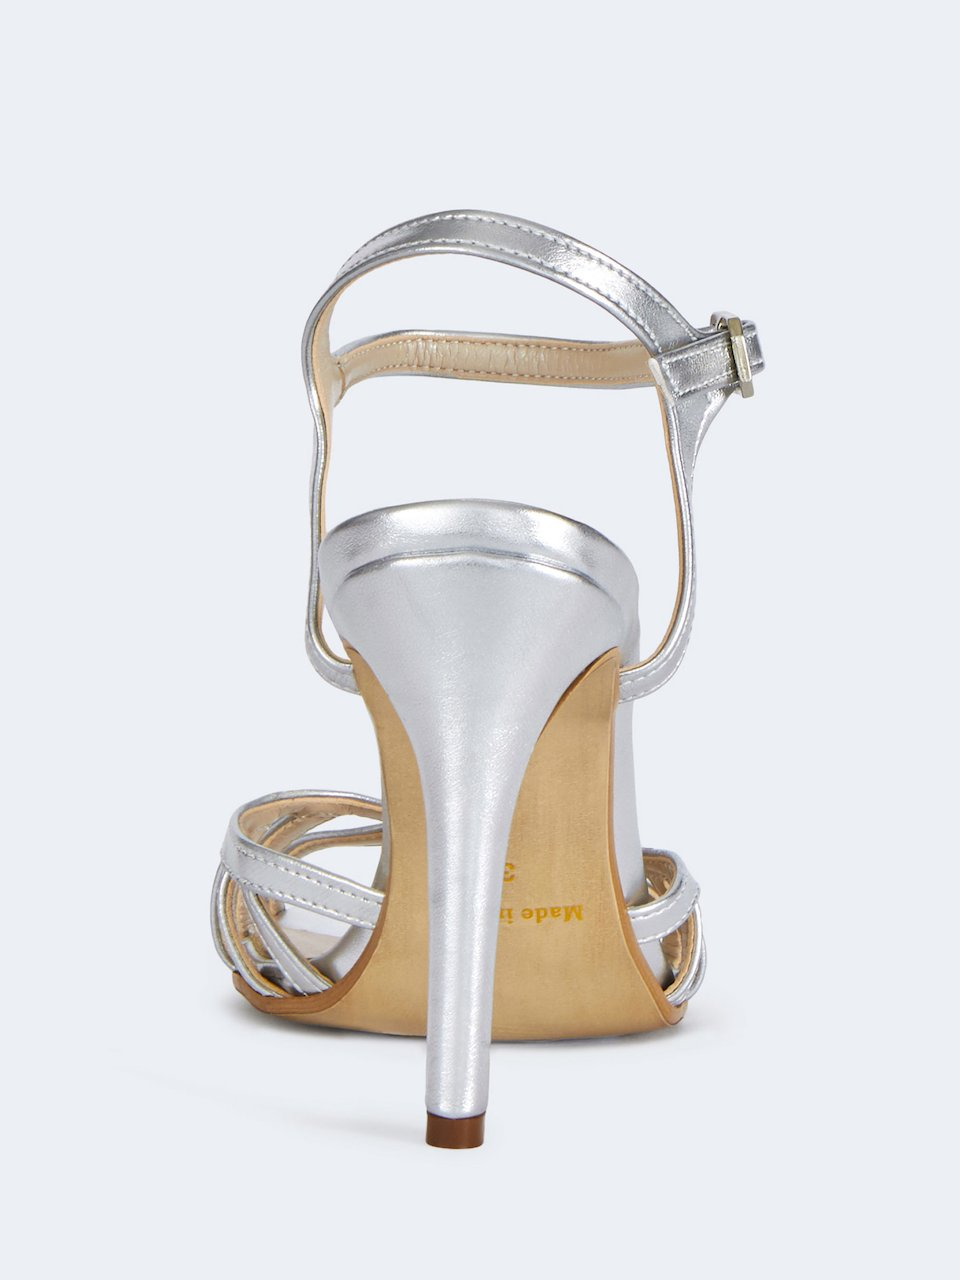 Con CinturinoBlumarine Con CinturinoBlumarine Con Metallizzati Sandal Metallizzati Sandal ® Sandal ® Metallizzati wOPXTlkiuZ